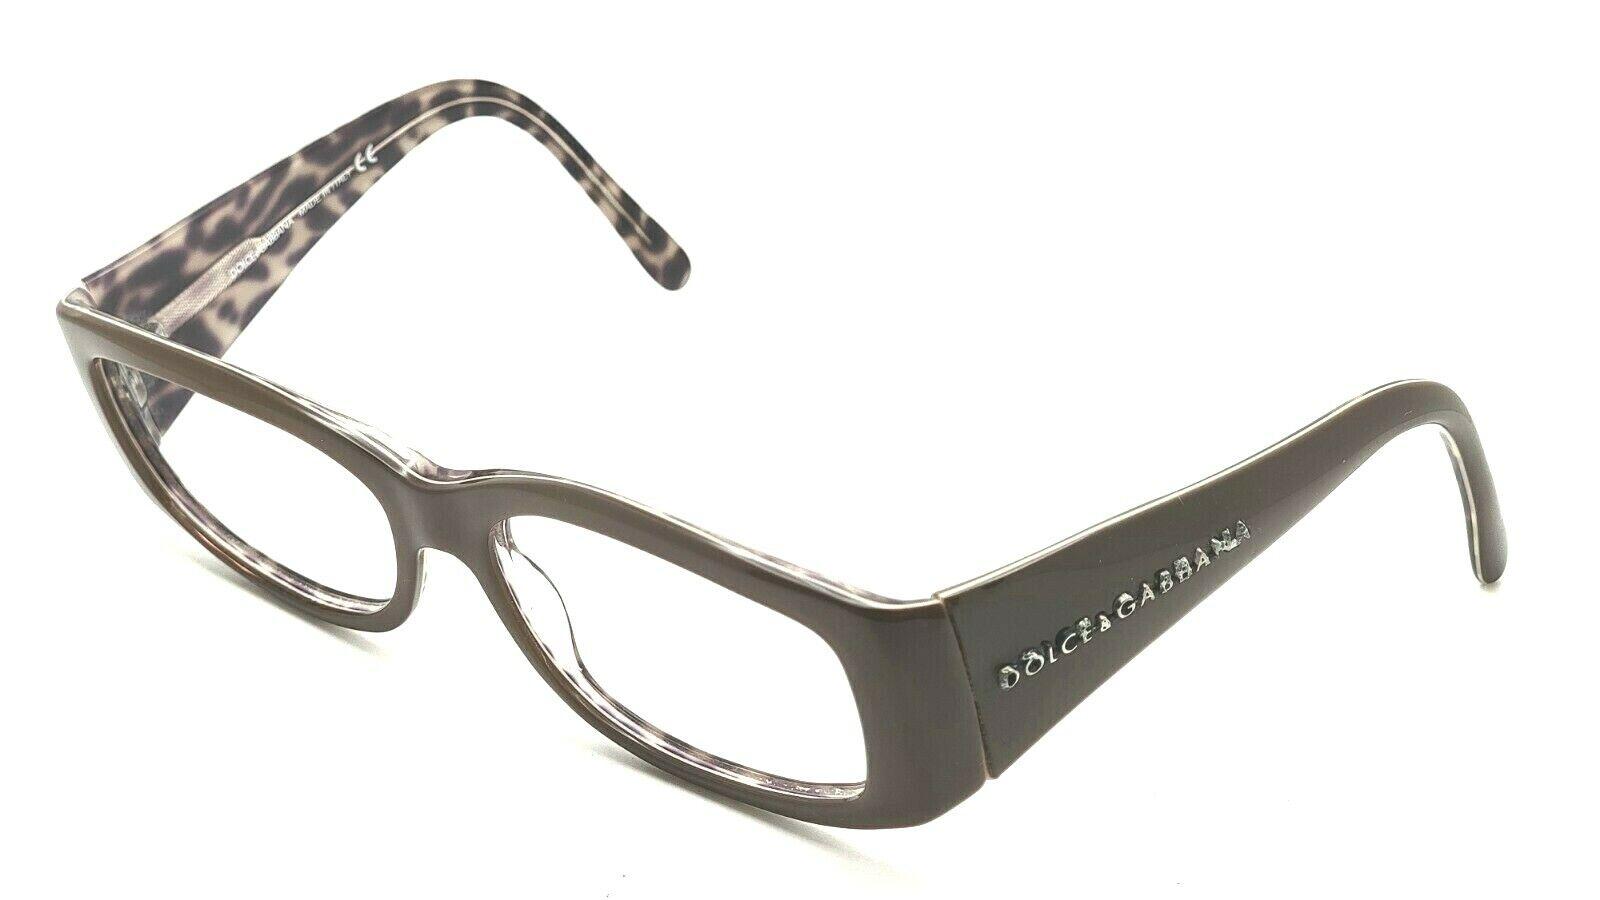 Dolce & Gabbana DG4008 565/73 BENT Brown Cheetah Oversized Sunglasses 57-16 130